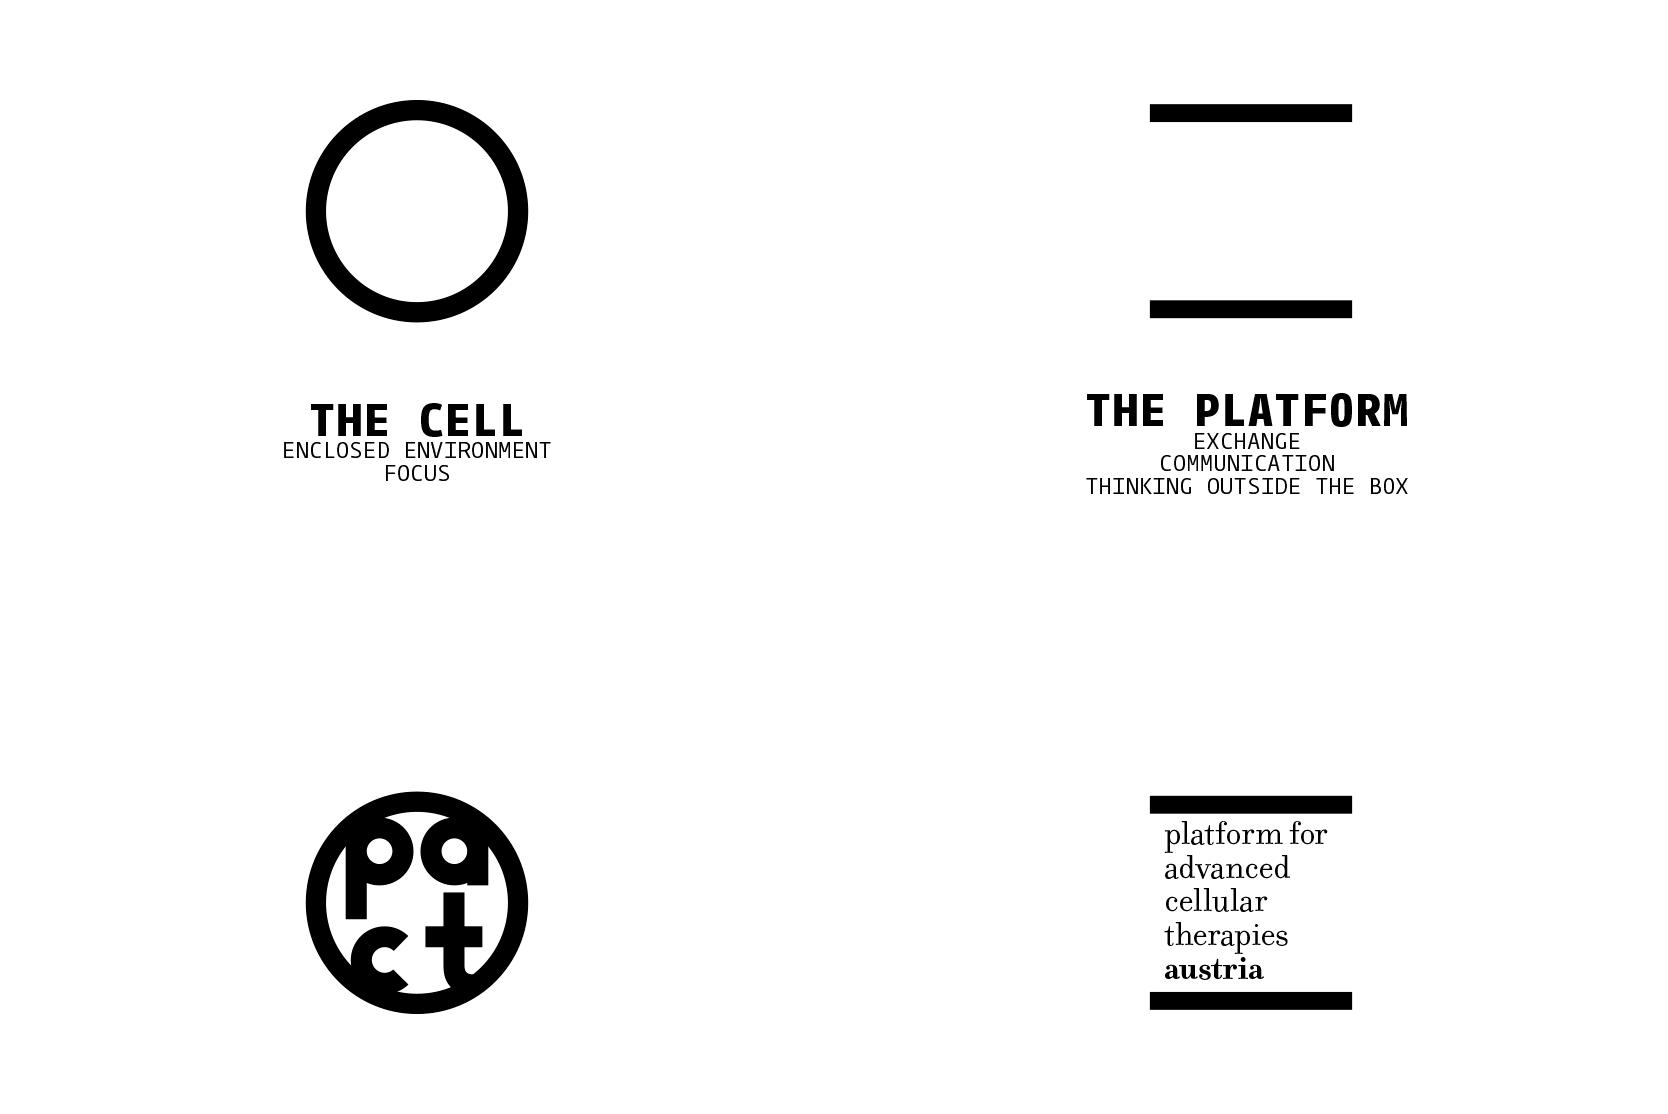 pact: Process